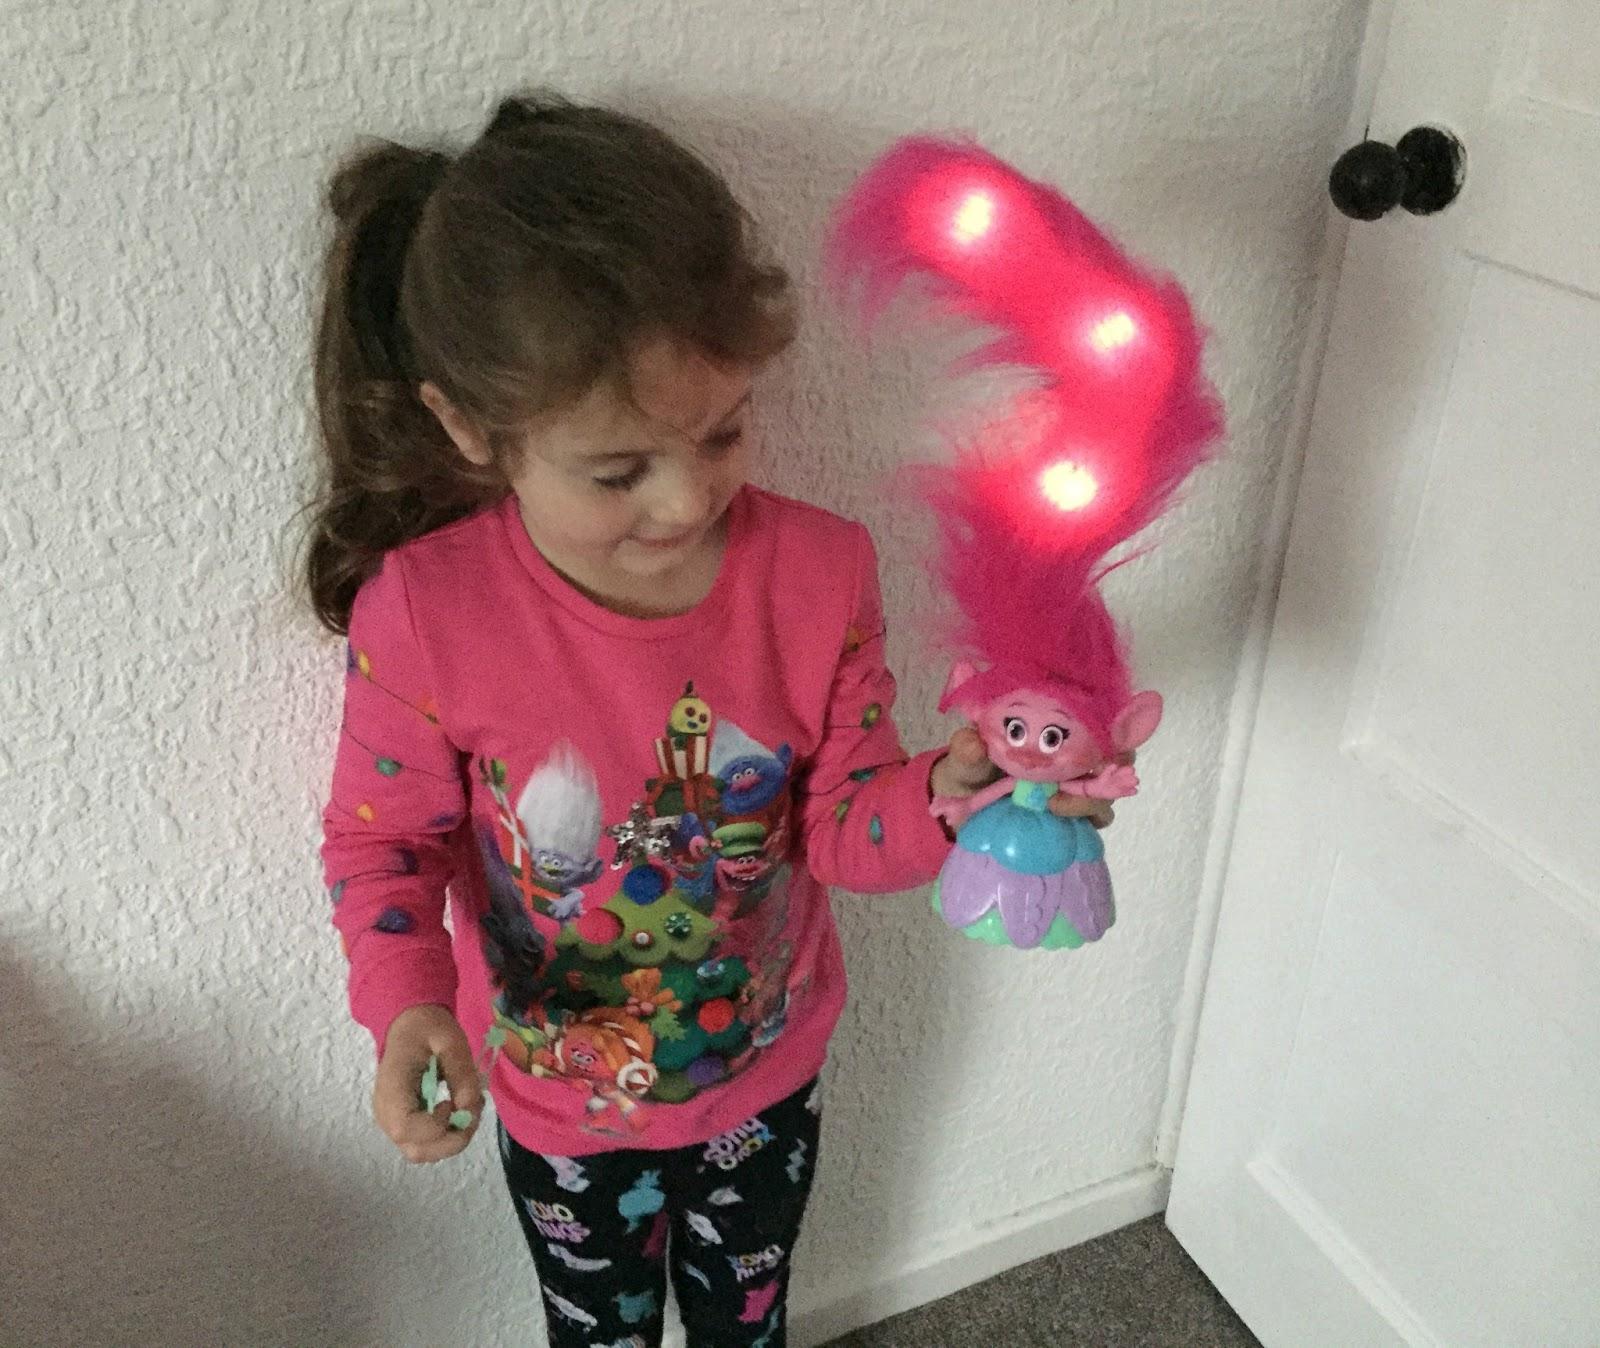 Newcastle Family Life Trolls Holiday Gift Ideas